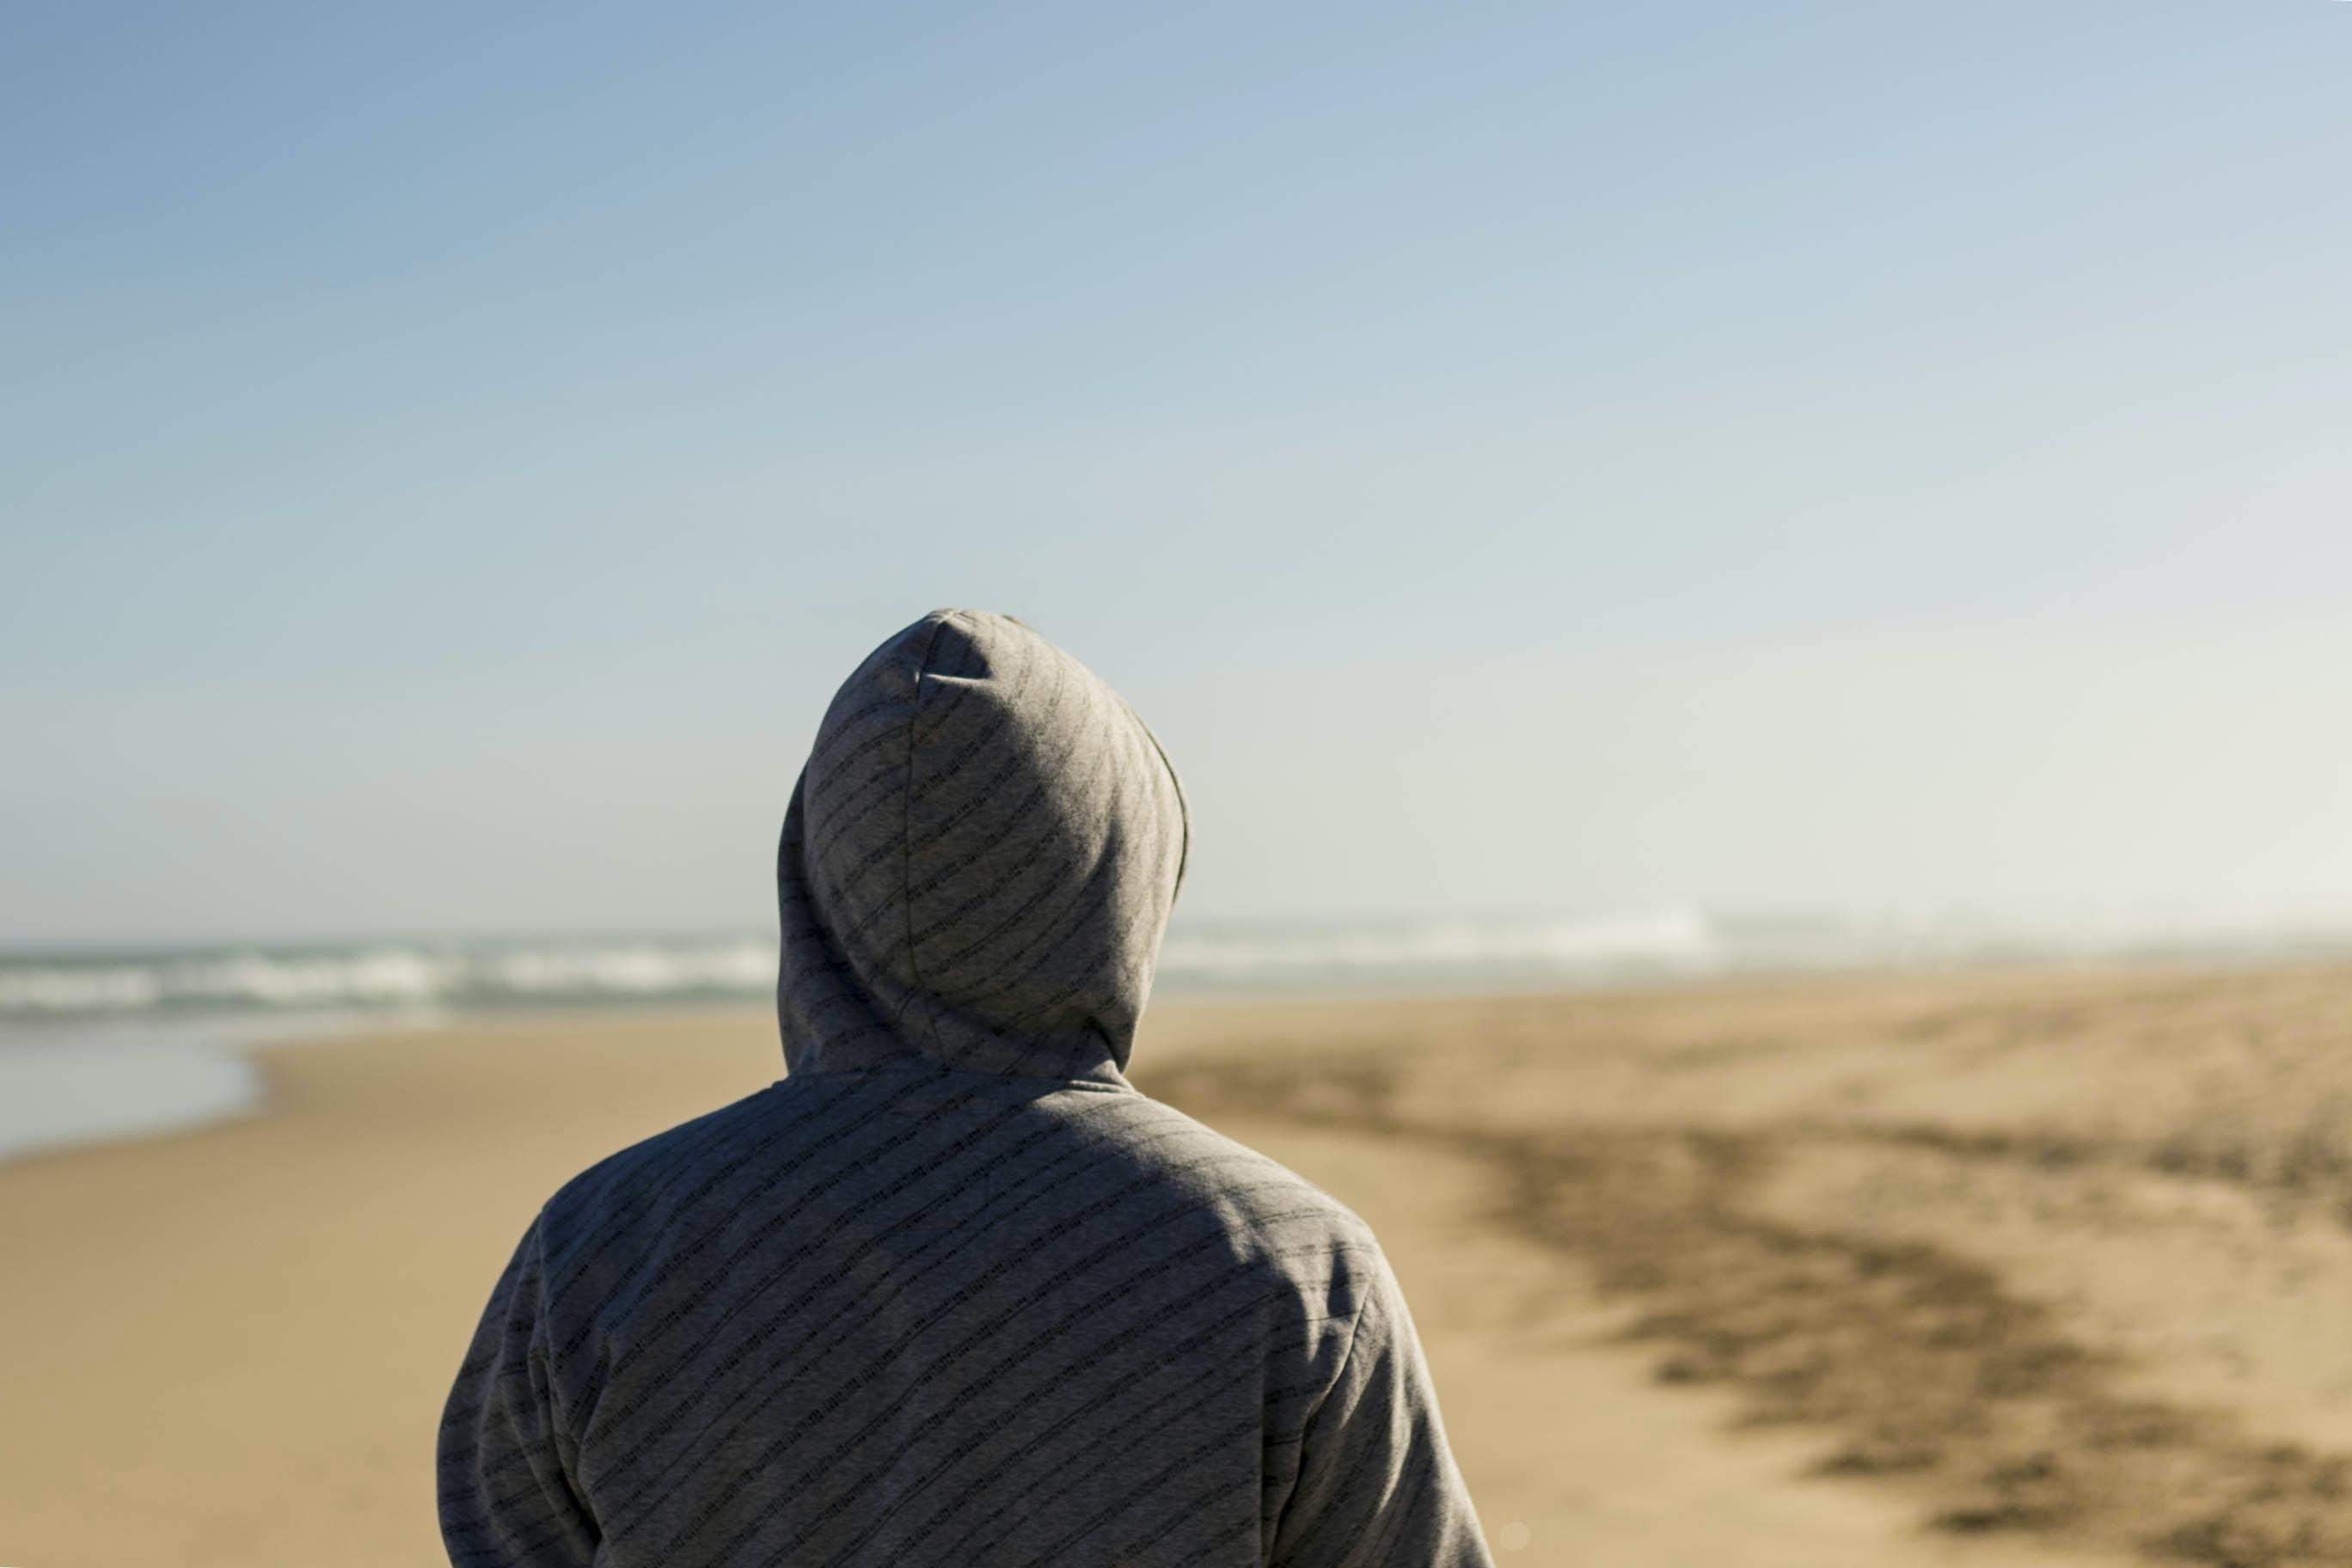 person wearing gray hooded top facing seashore